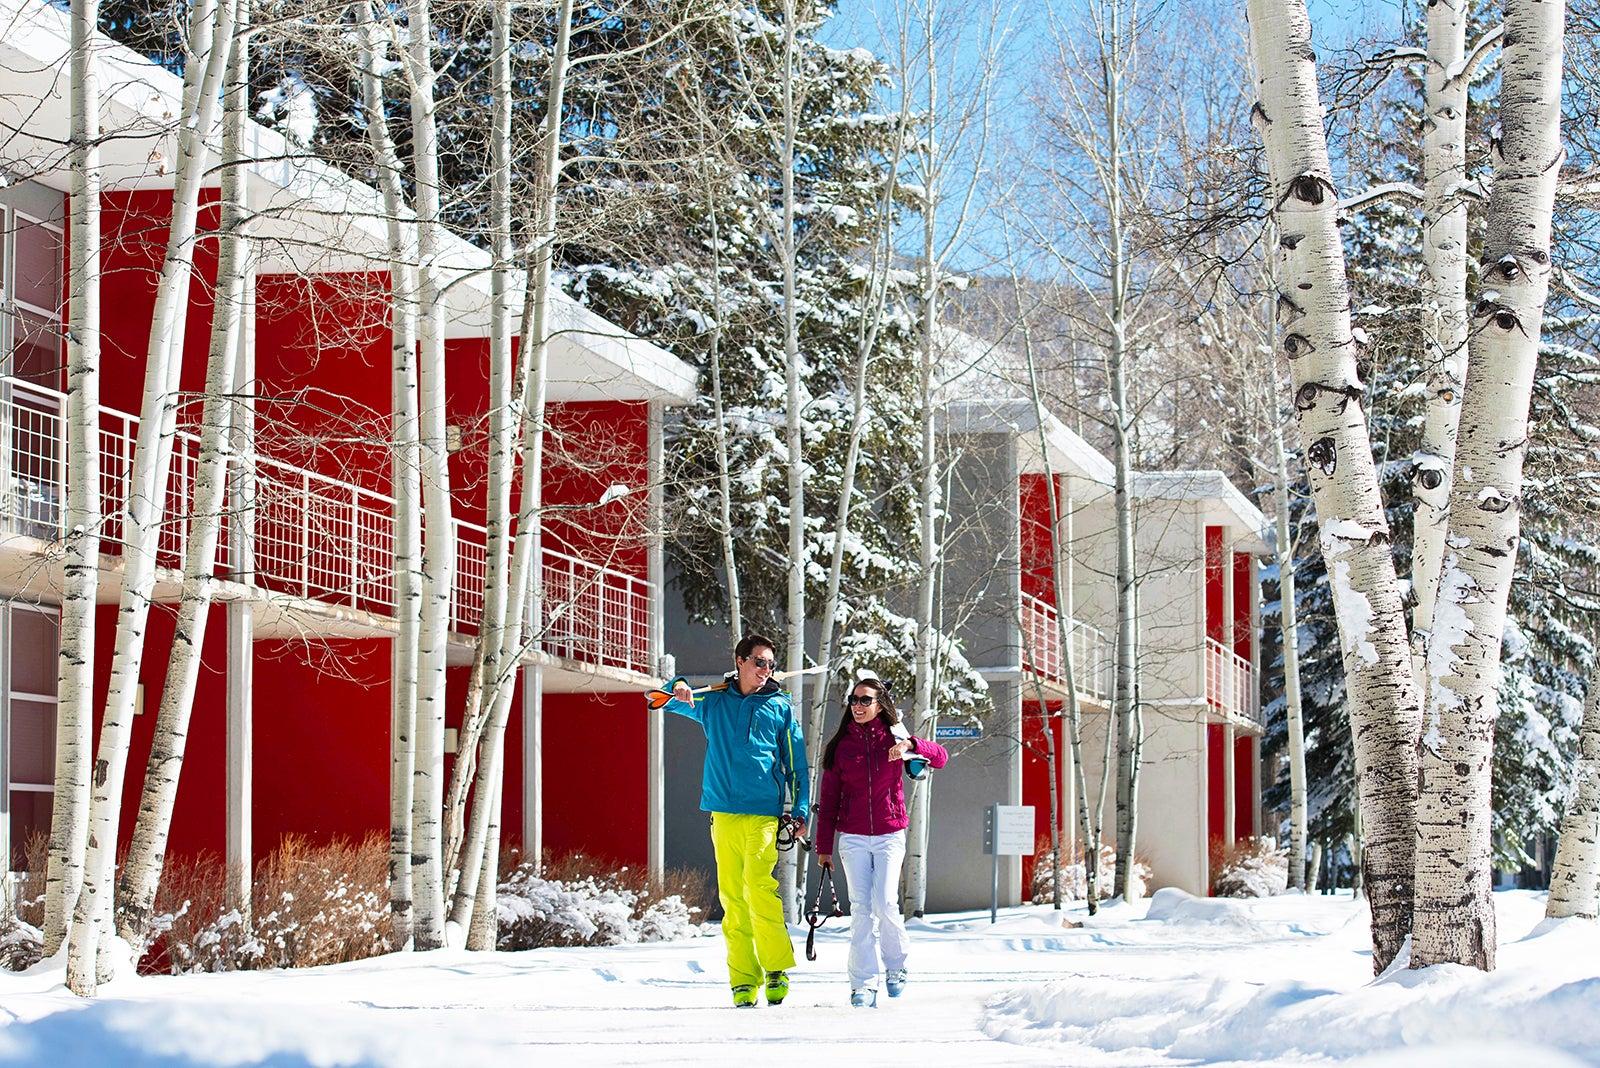 Exclusive deal alert: Aspen Meadows Resort flash sale - The Points Guy